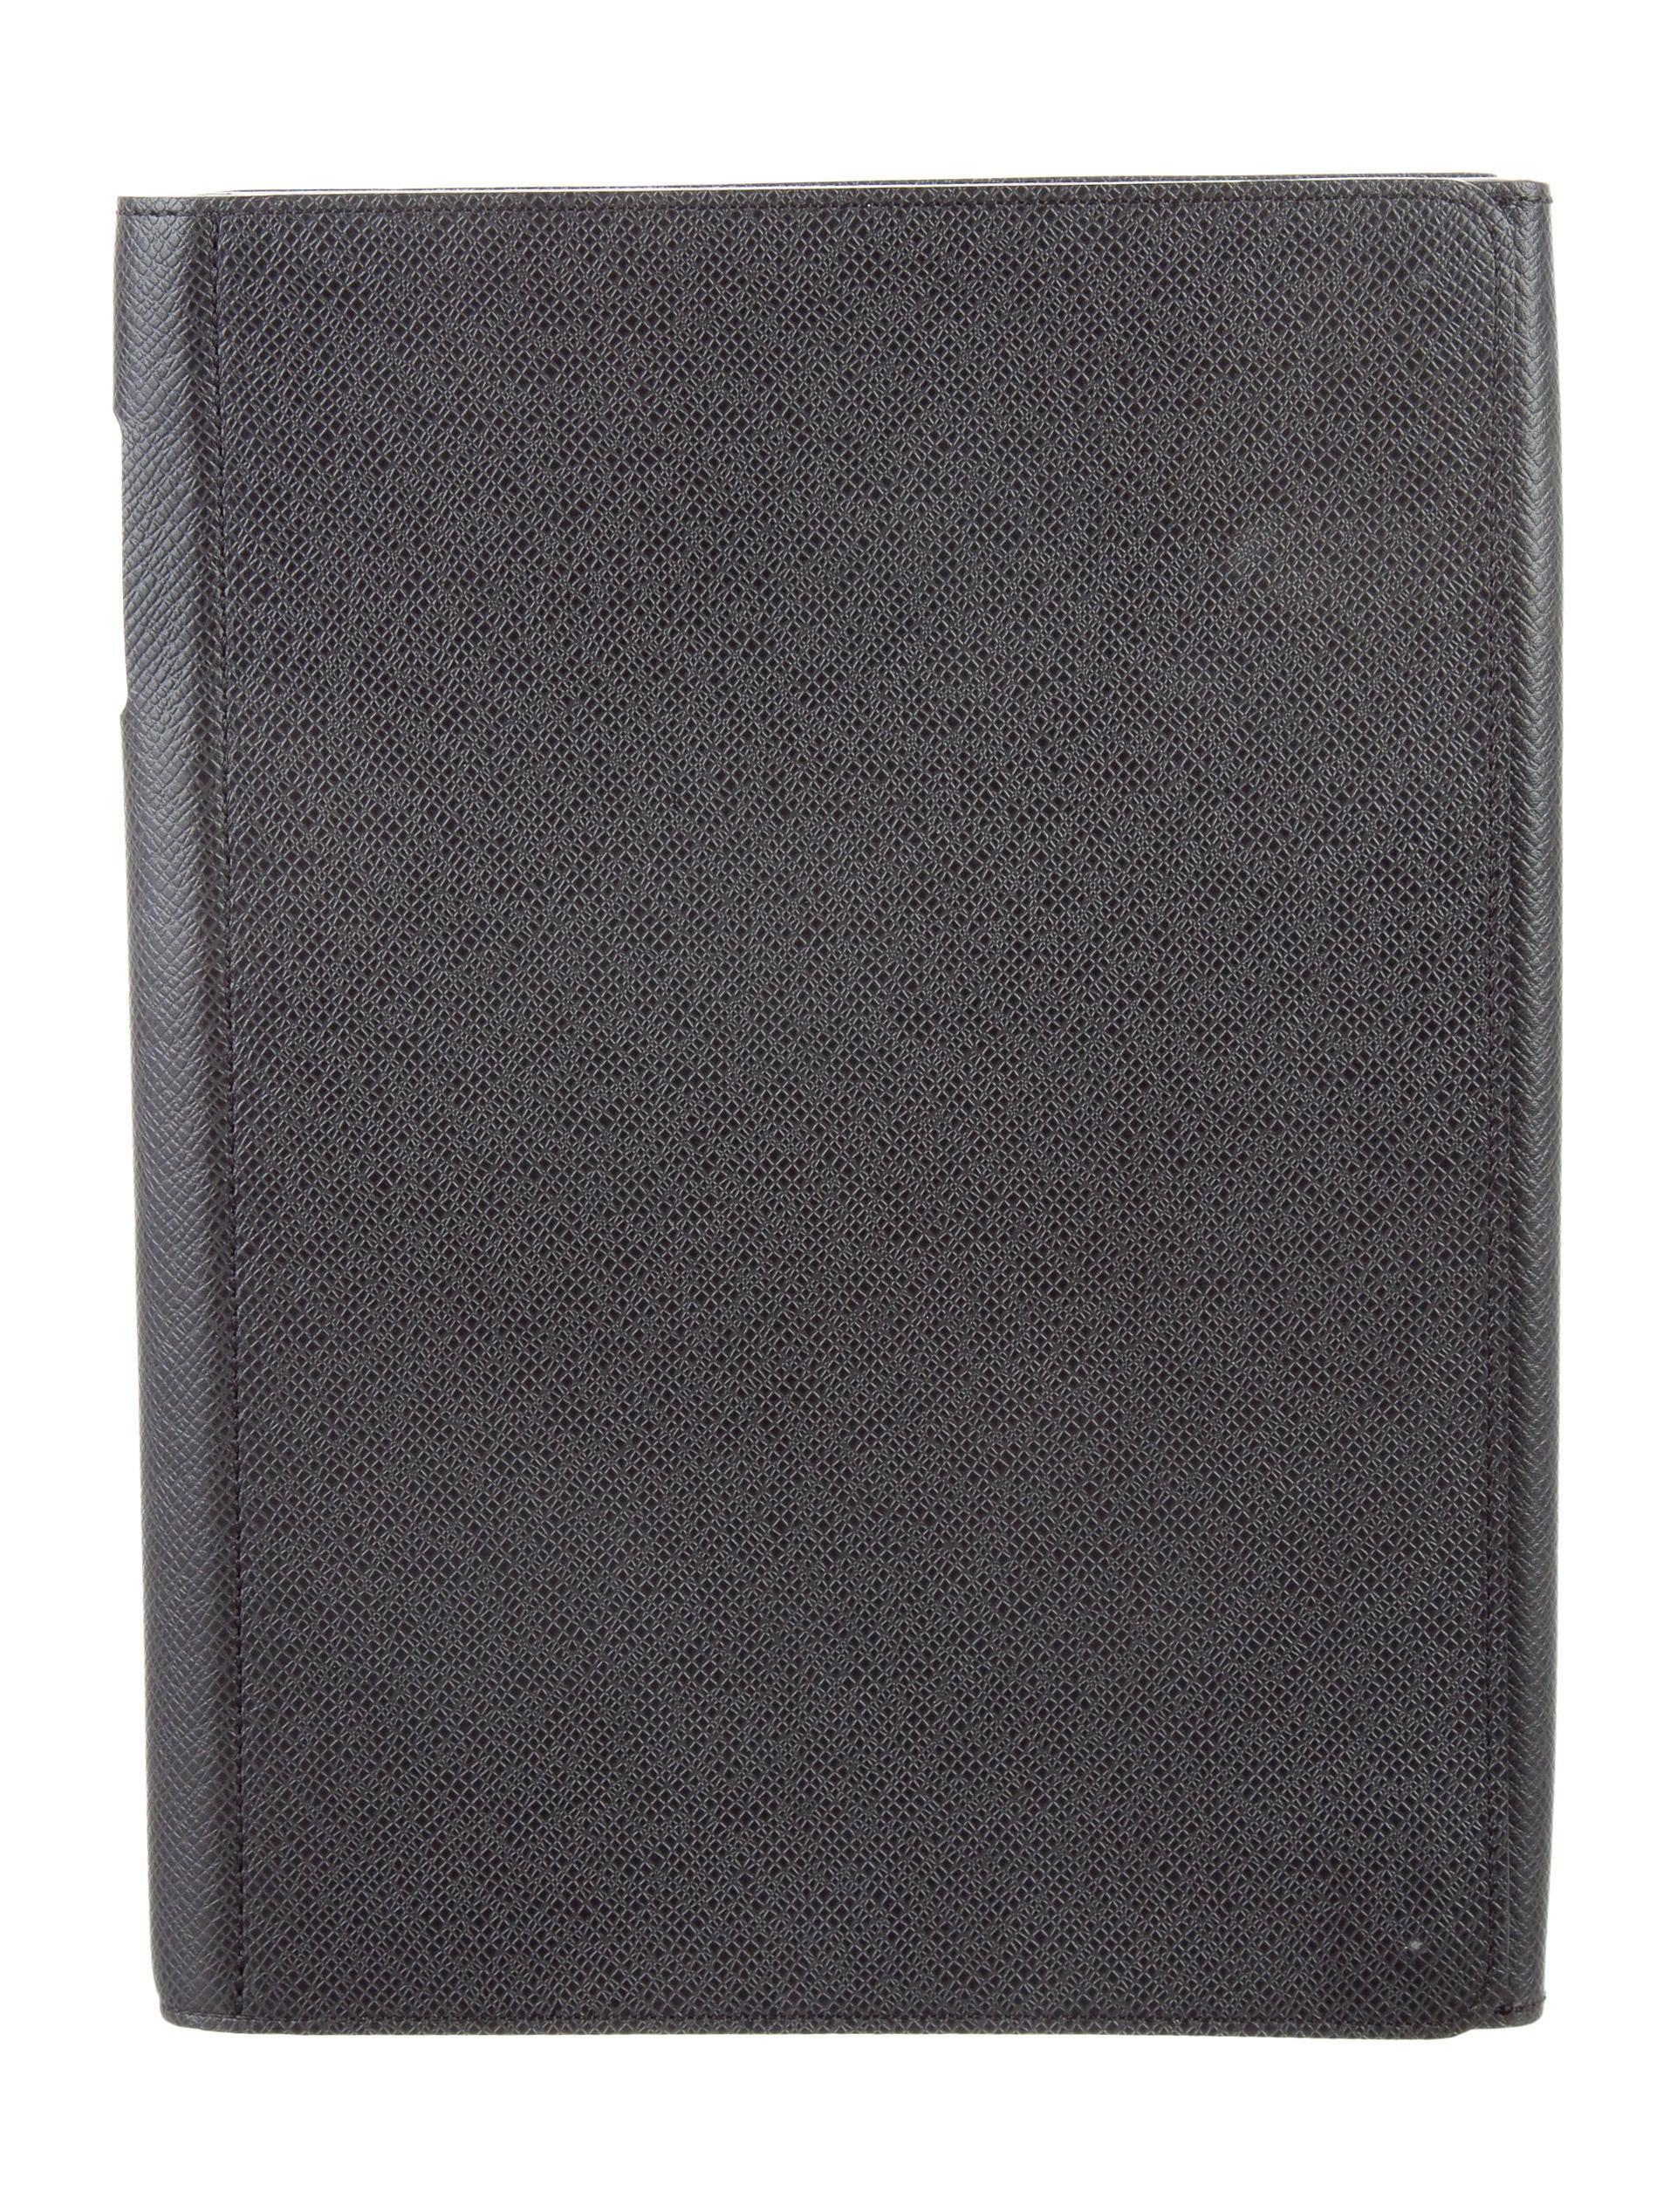 Louis Vuitton Taiga Ipad Case Technology Lou132341